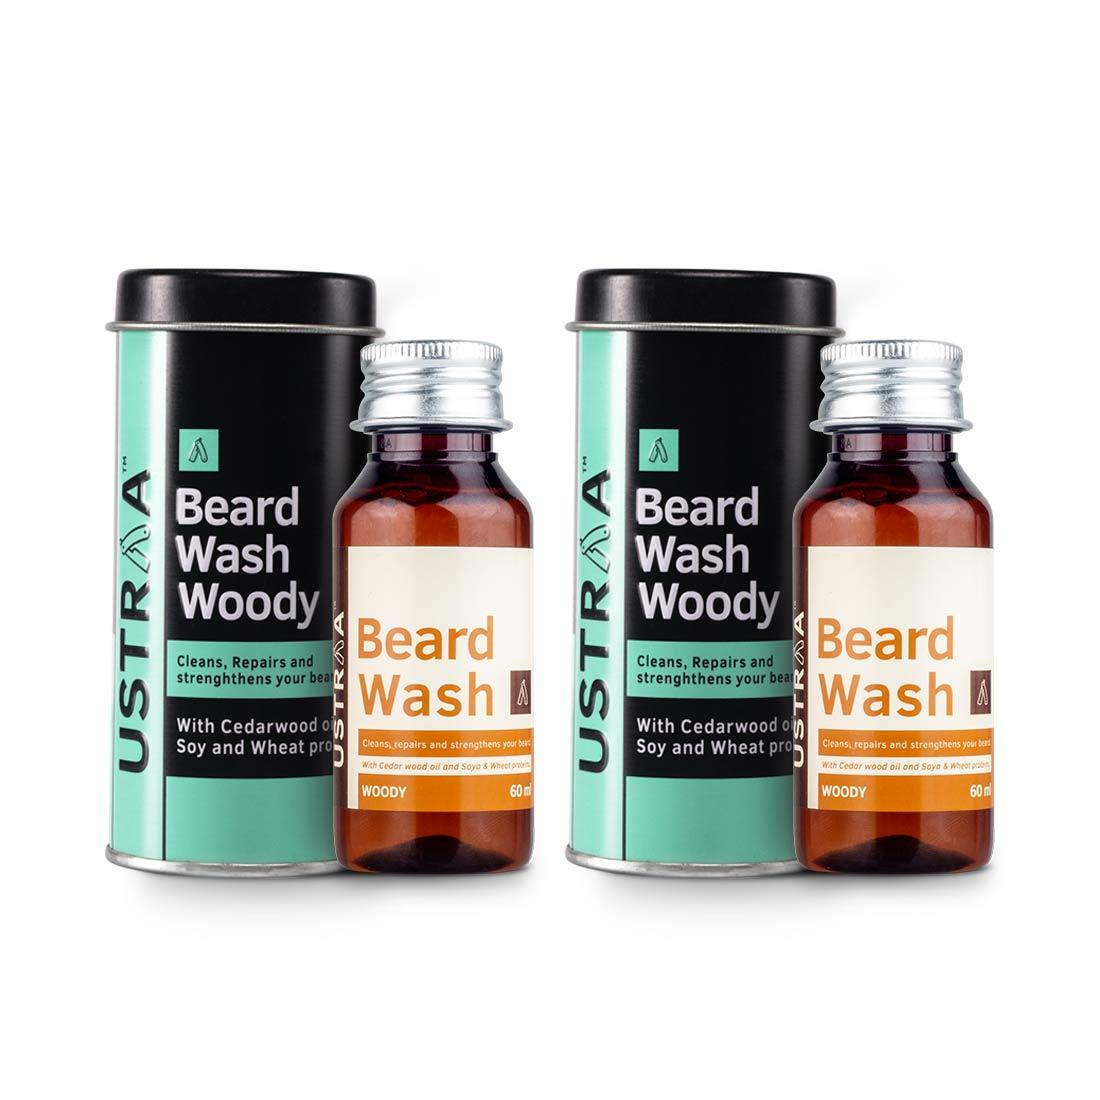 Ustraa Premium Beard Wash Combo (Woody): Your Beard's New Best Friend